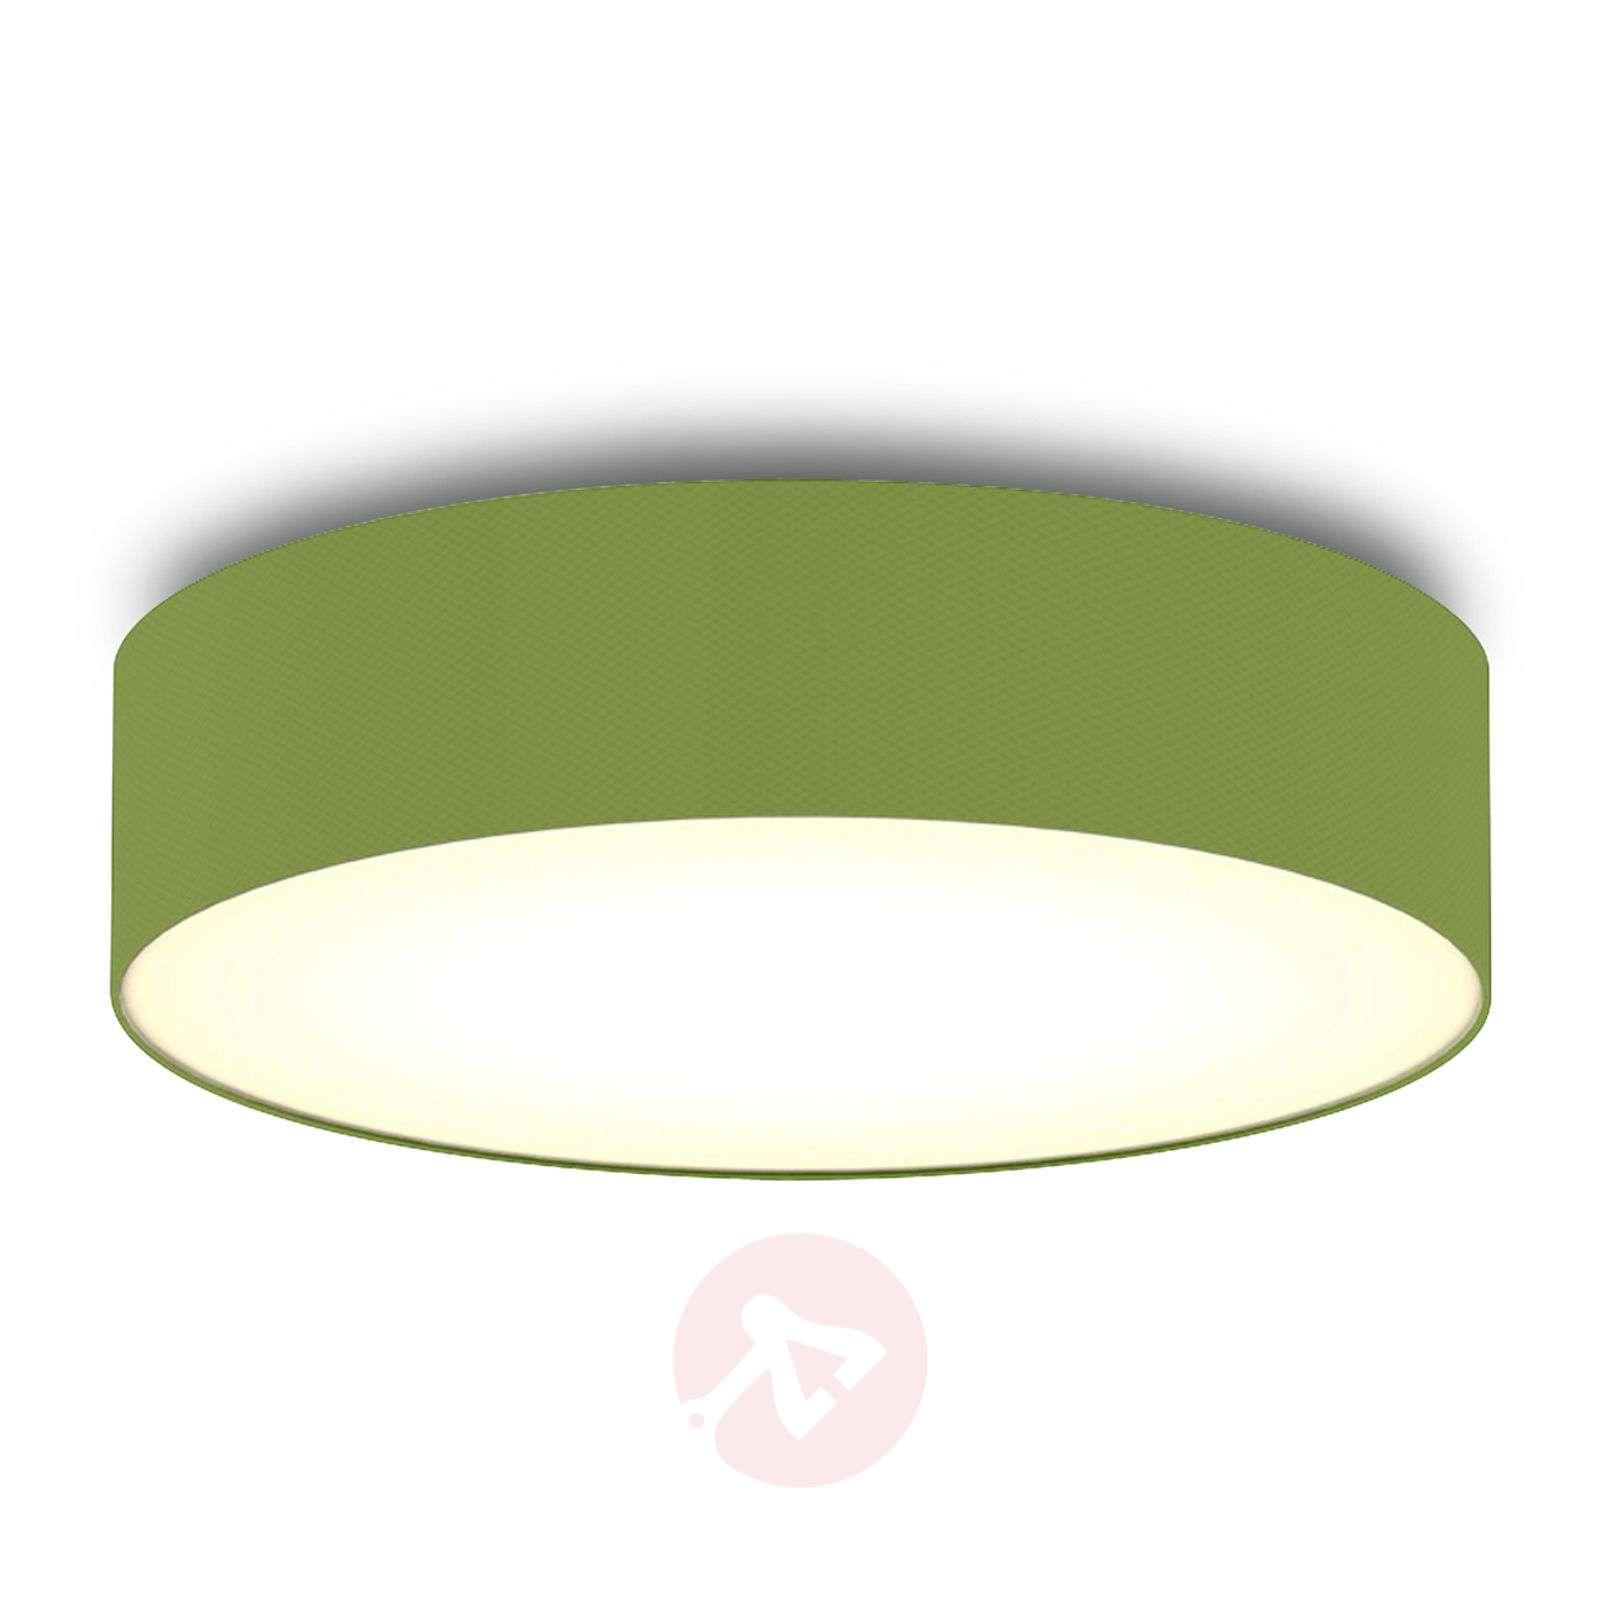 Green fabric ceiling light Ceiling Dream 40 cm-8567103-01